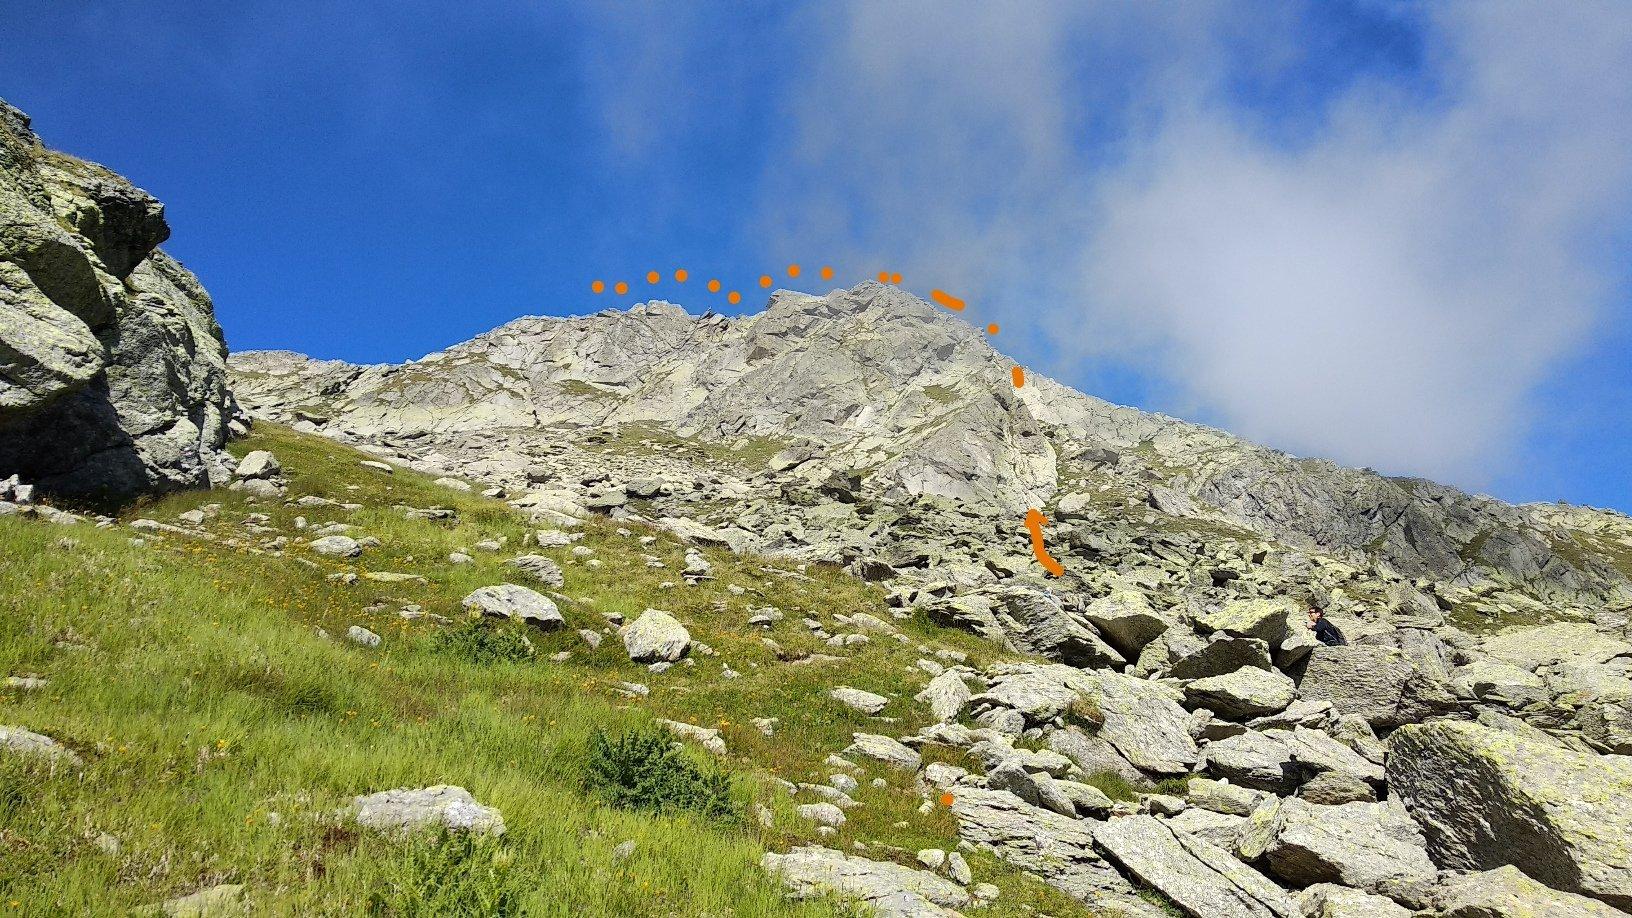 Dronalette dal Colle del Gran San Bernardo 2018-08-11